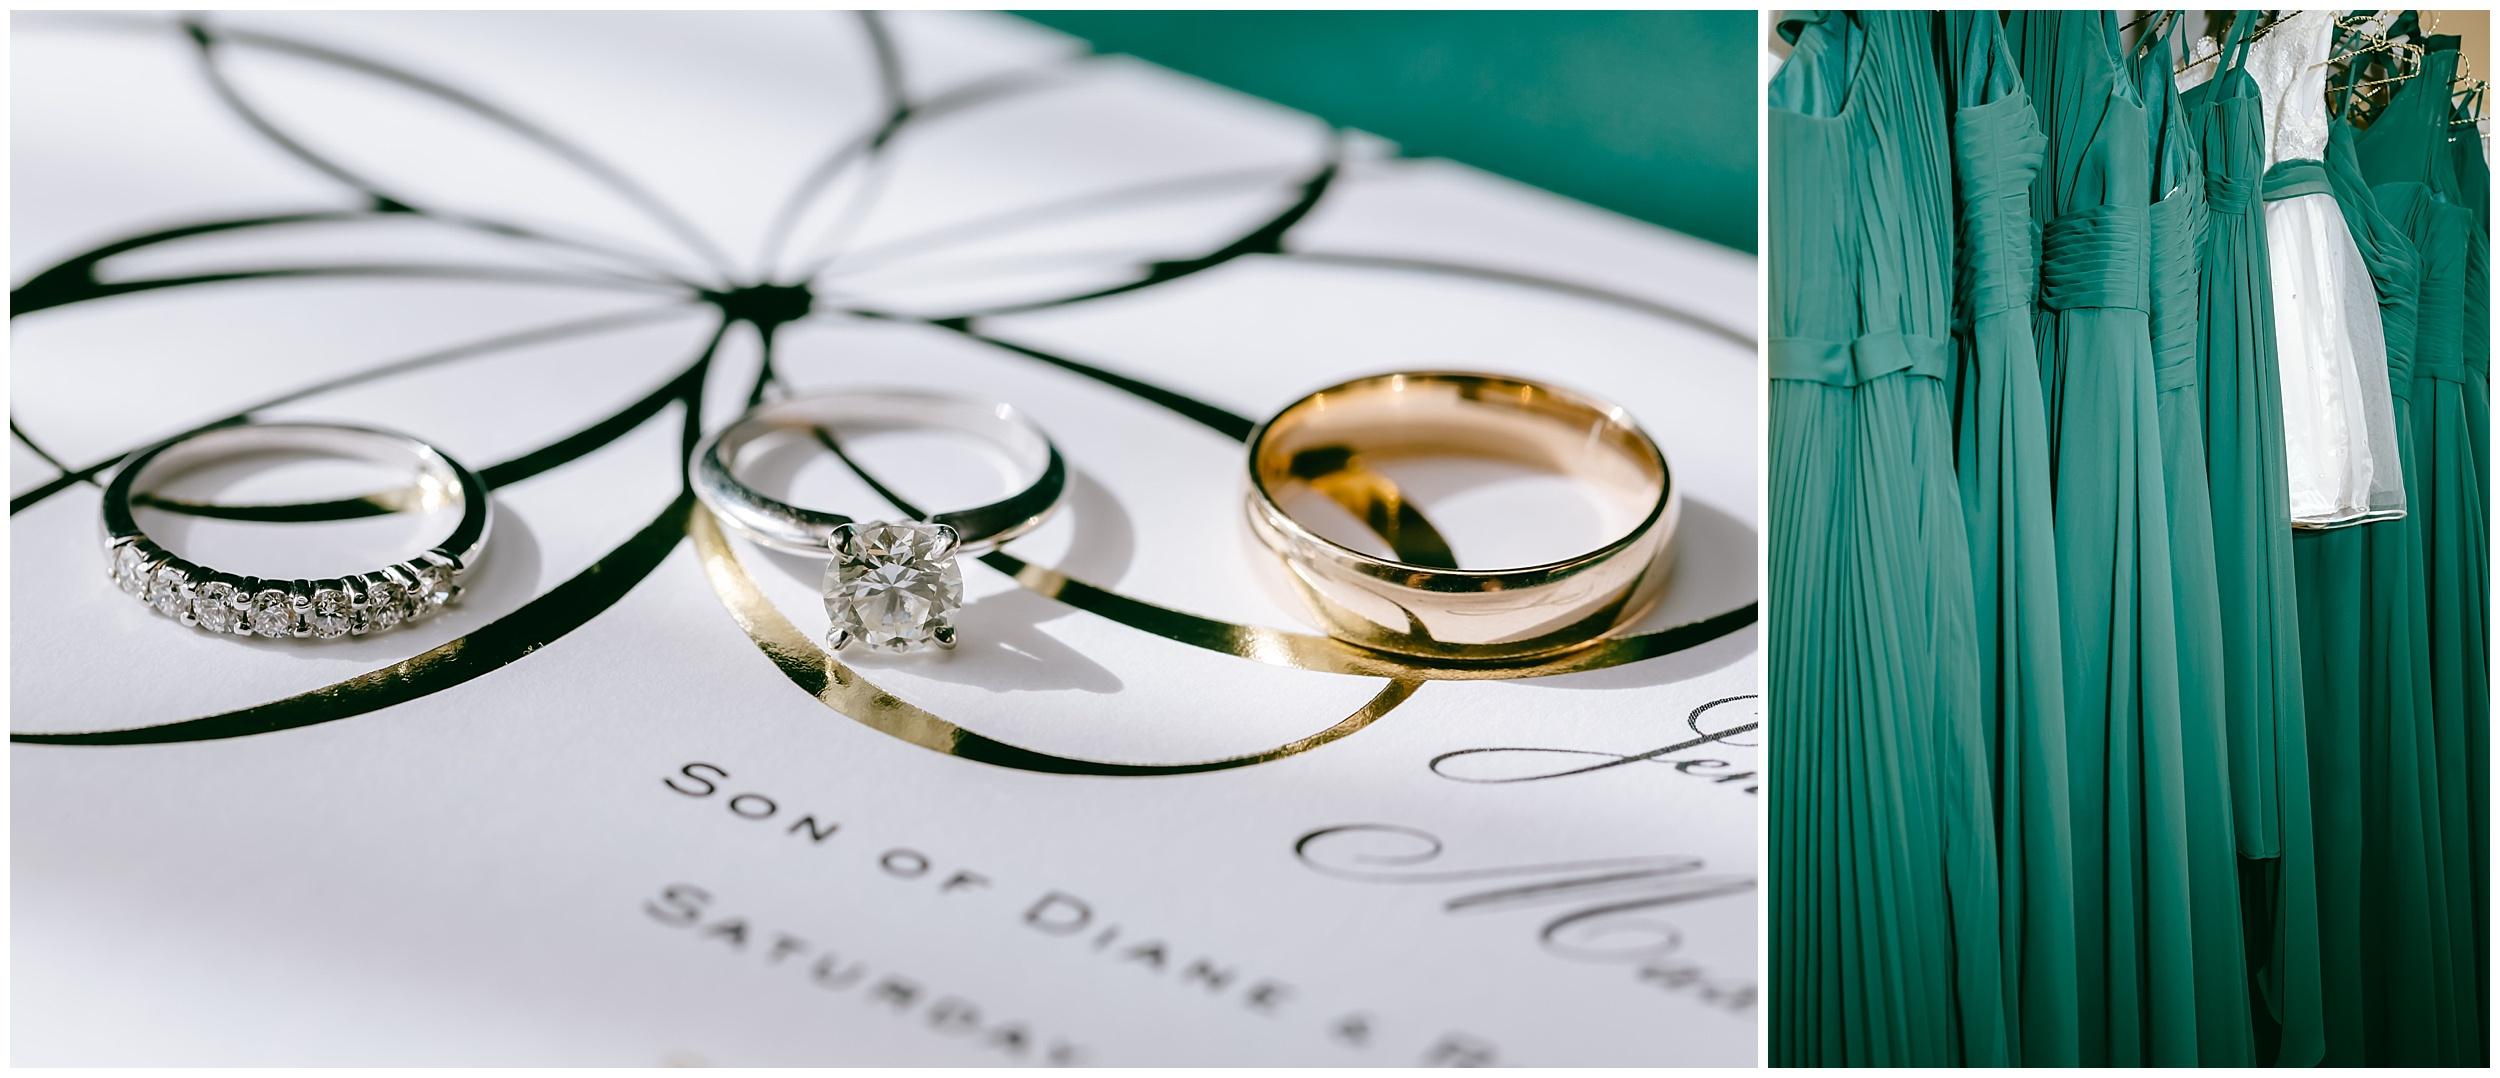 wedding-invitation-rings-bridesmaids-dresses-washington-dc-photographer